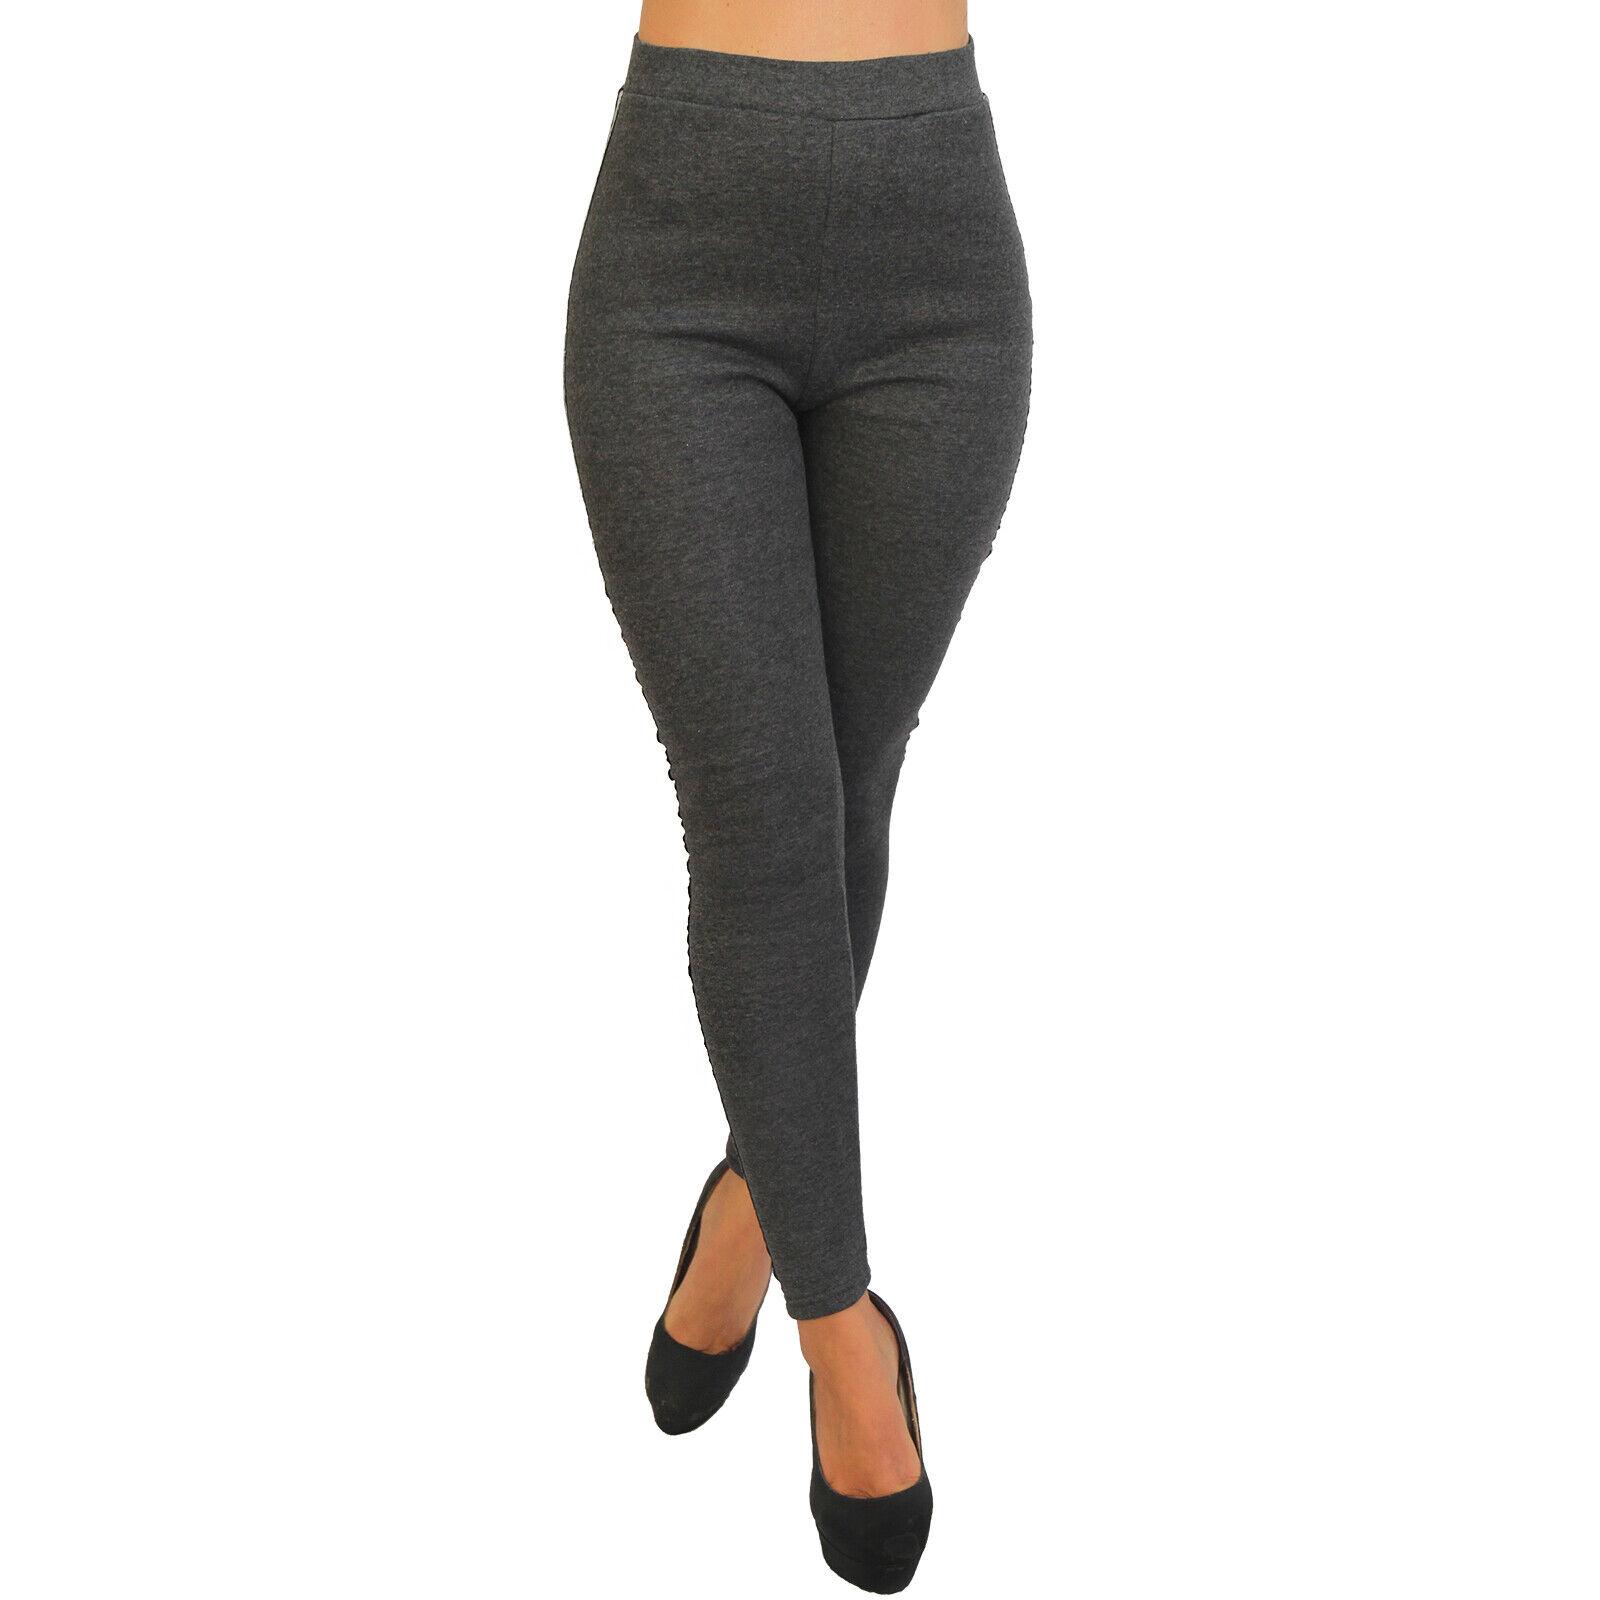 Damenmode Sport Hose Leggings Butt Lifter Yoga Tregging Fitness Stretch Jogger